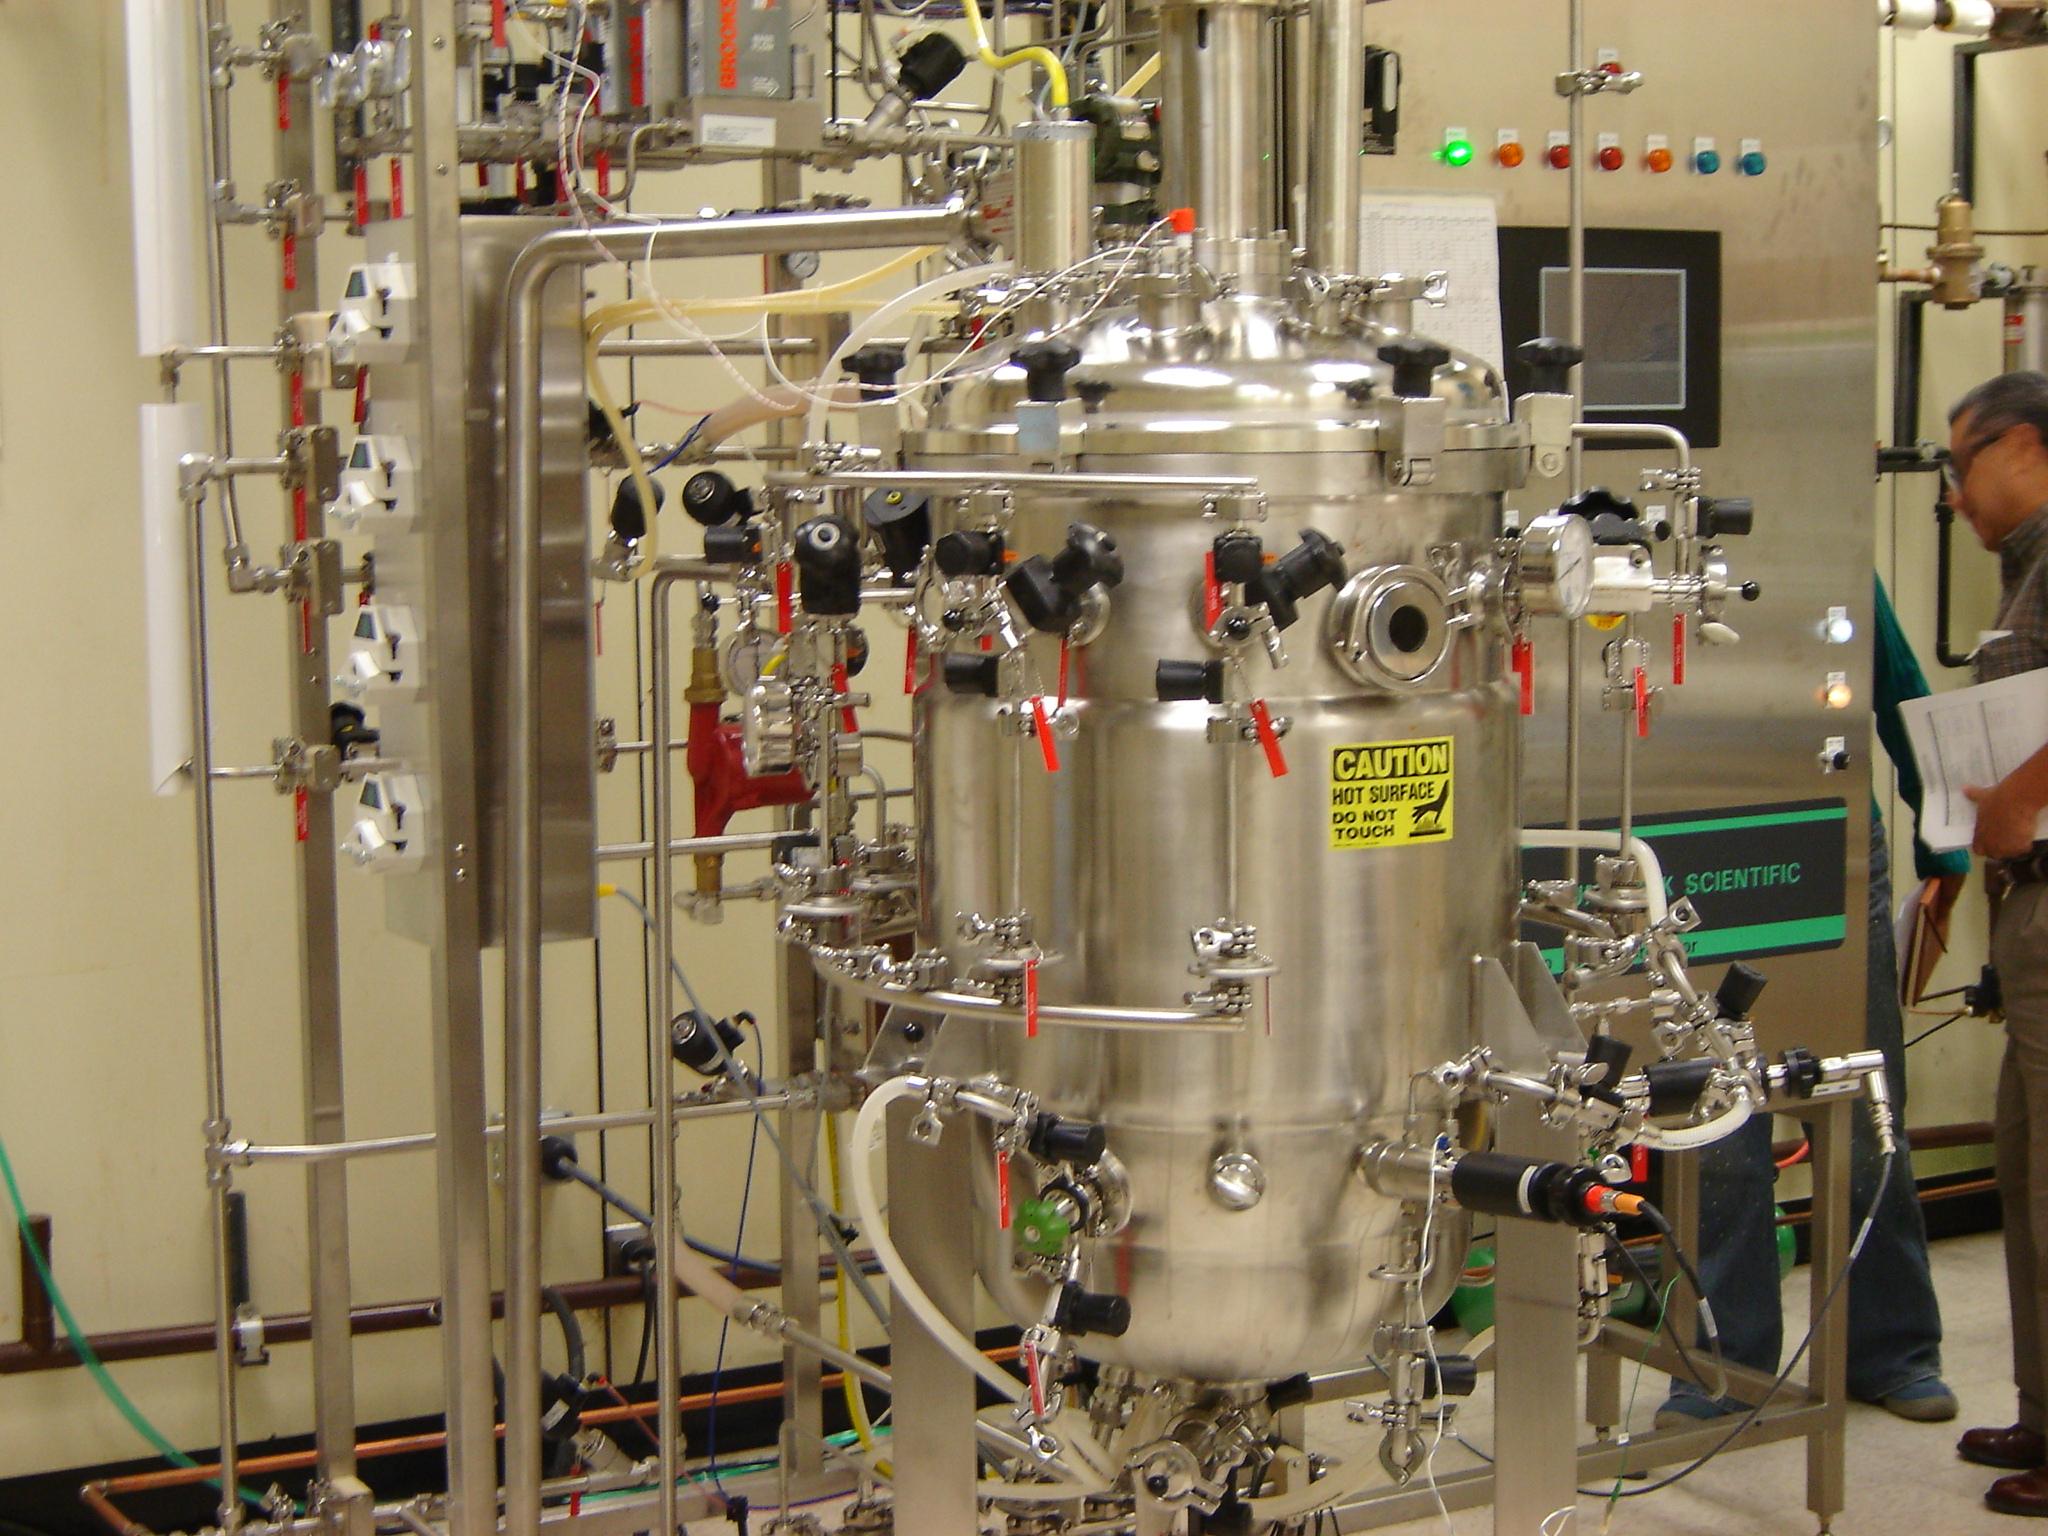 150 Liters New Brunswick Scientific Fermenter Bioreactor